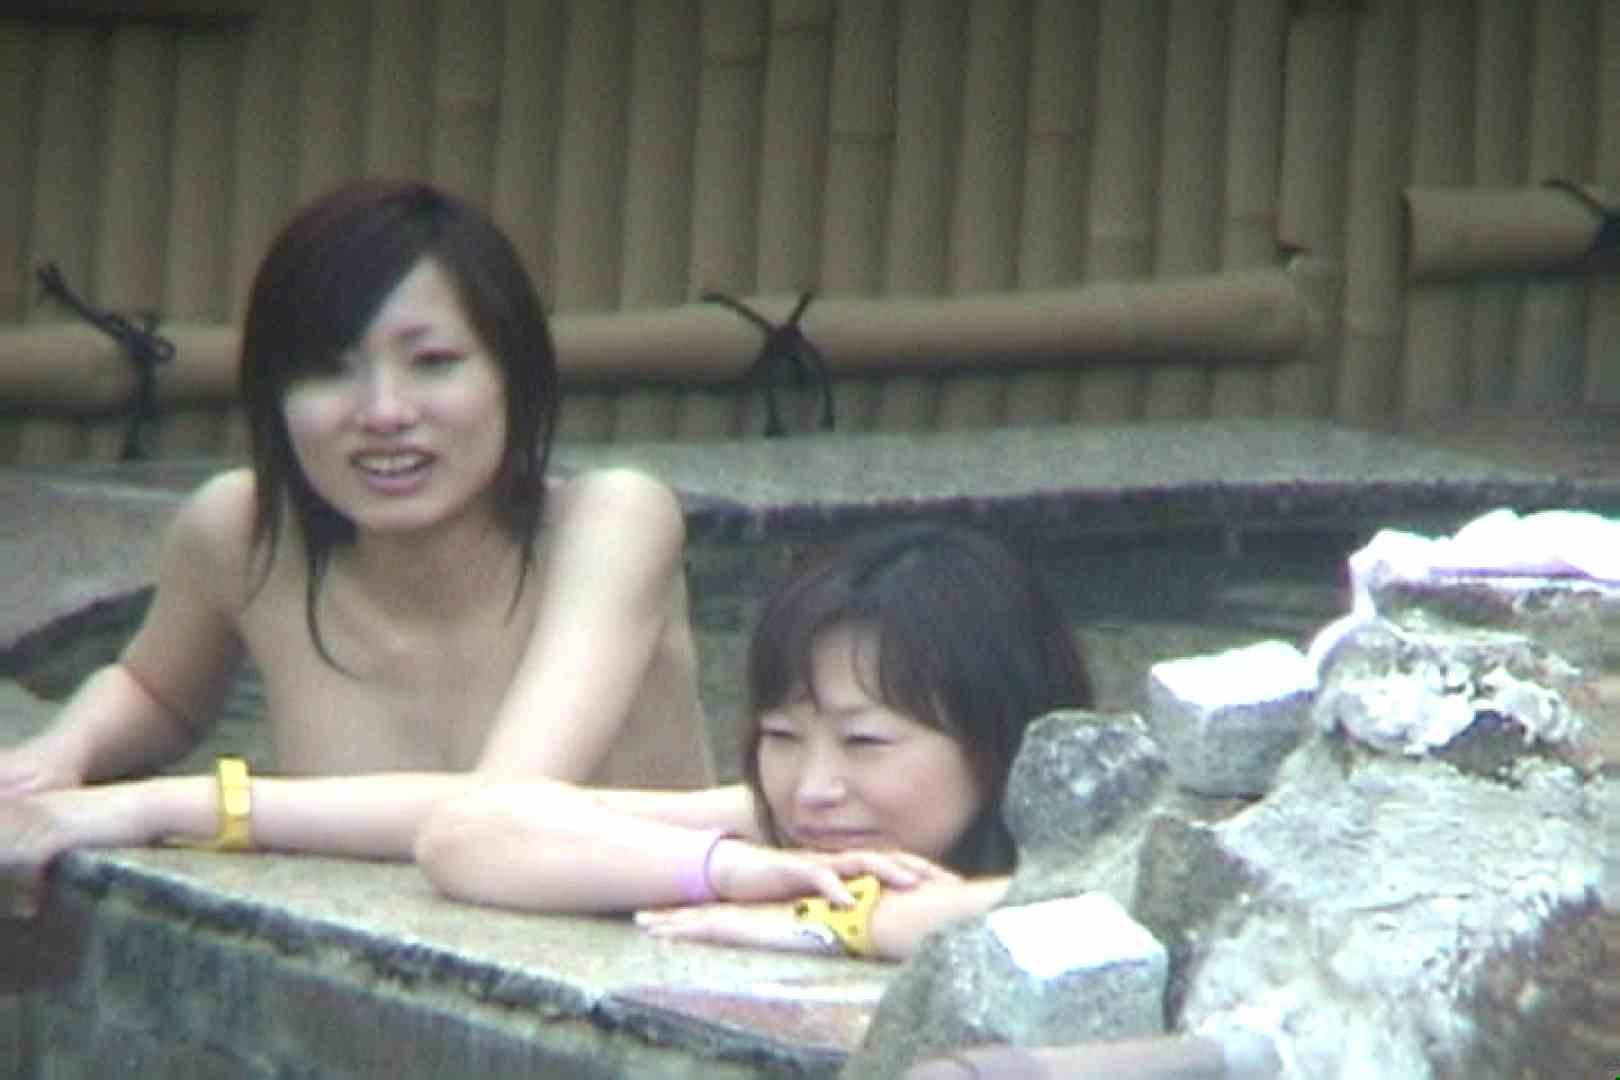 Aquaな露天風呂Vol.58【VIP限定】 盗撮   OLセックス  89画像 49